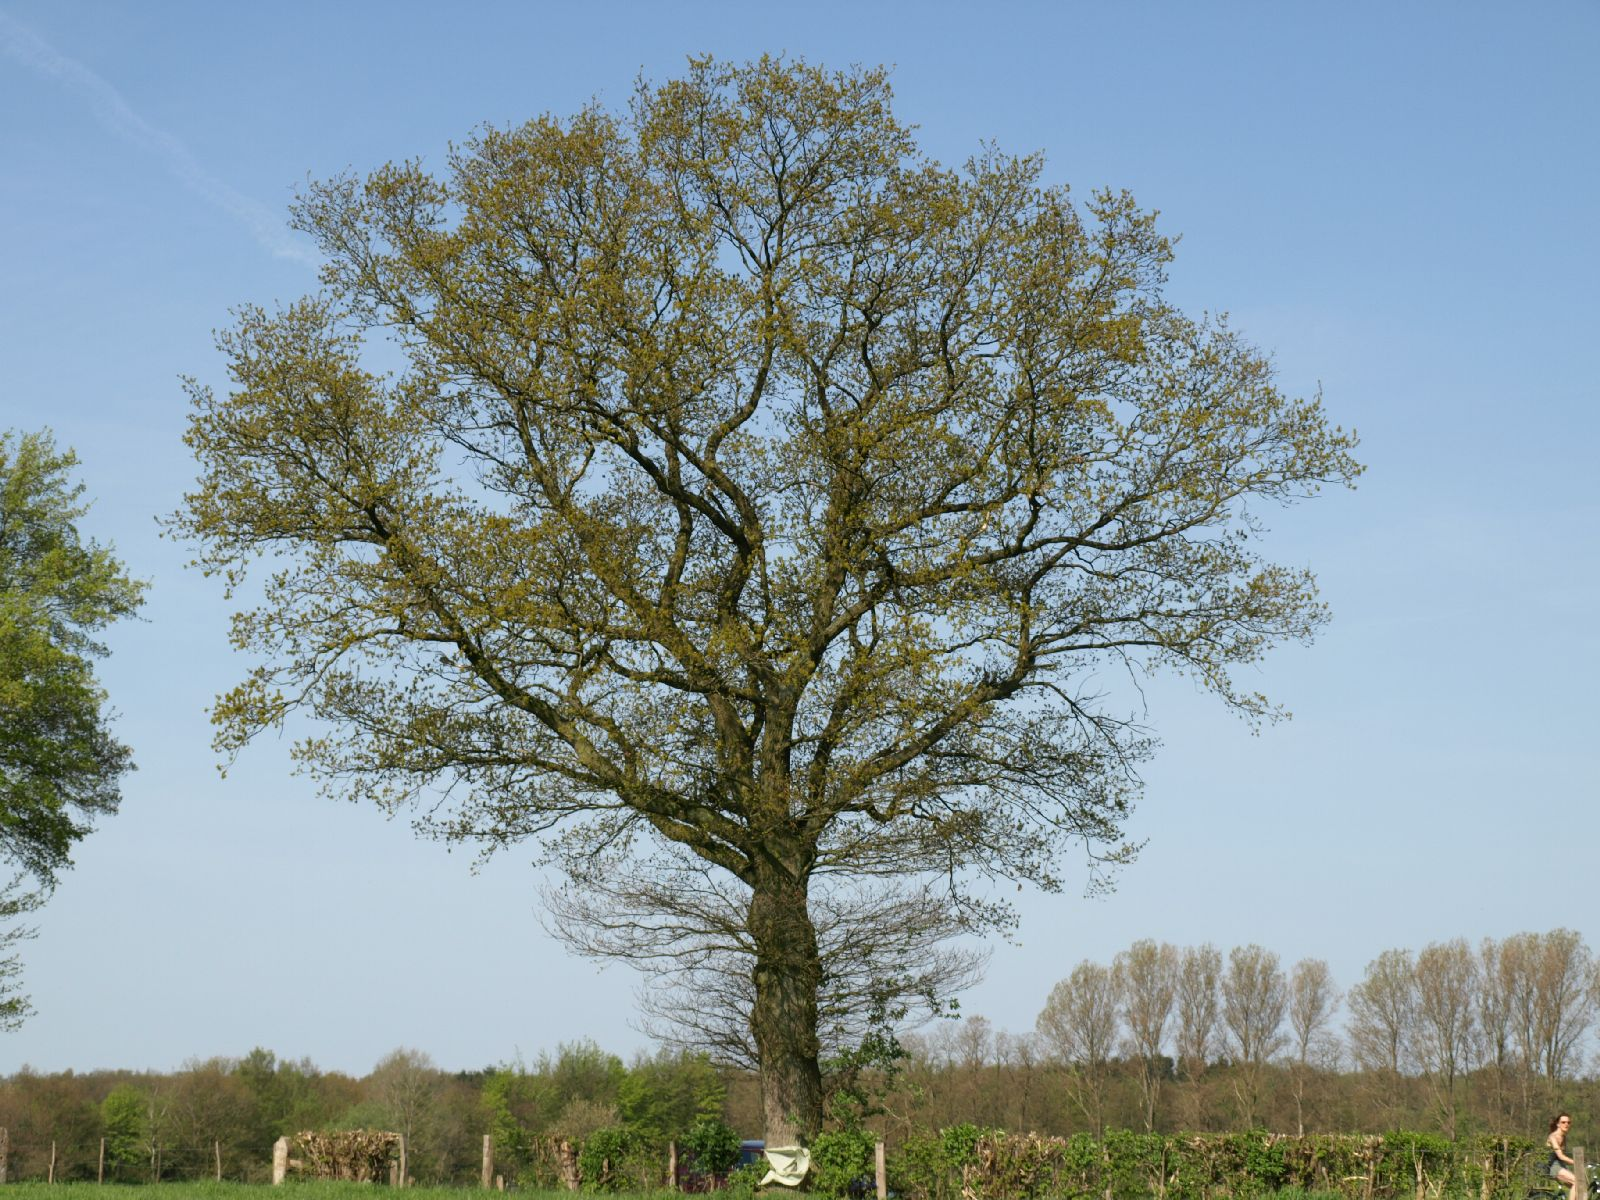 Pflanzen-Baum-Foto_Textur_B_P5042379